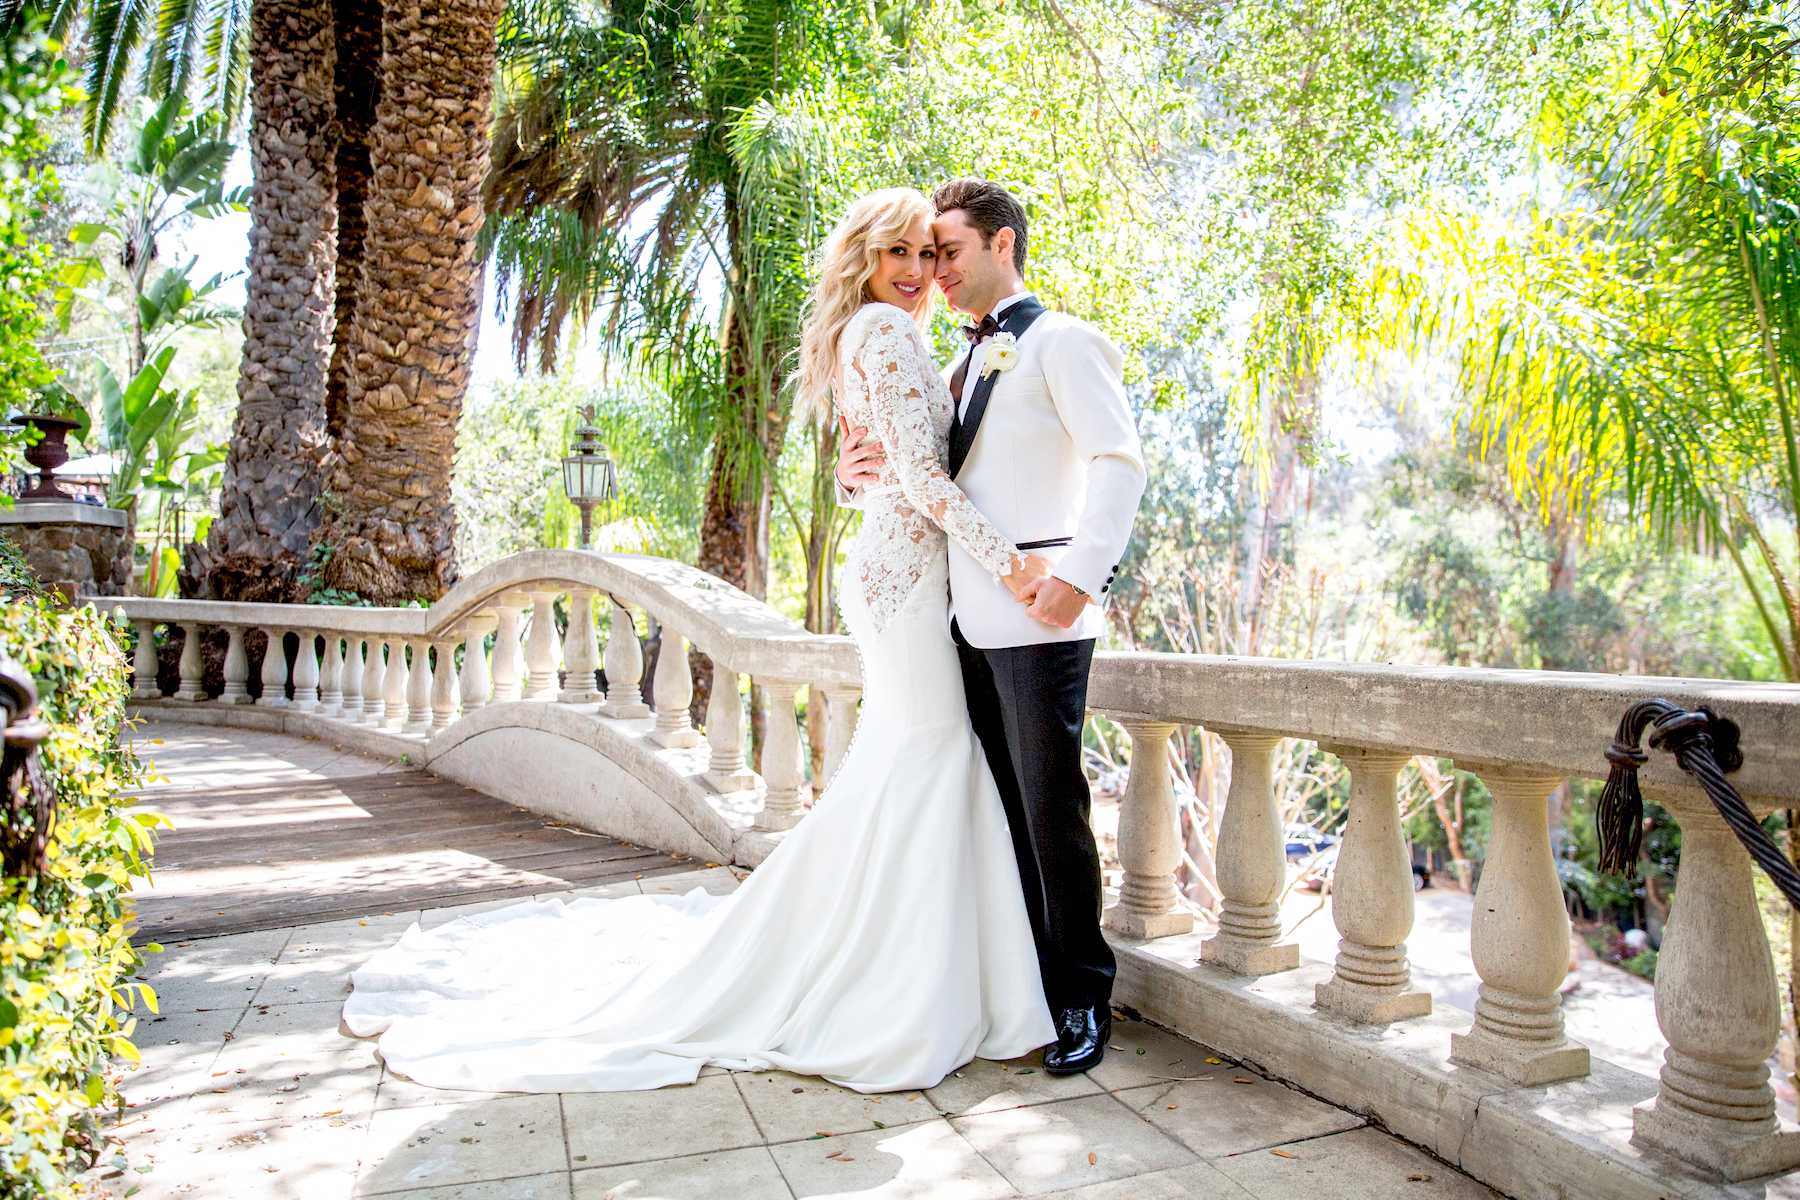 Lindsay Arnold Wedding.Dwts Pros Emma Slater And Sasha Farber S Wedding Video